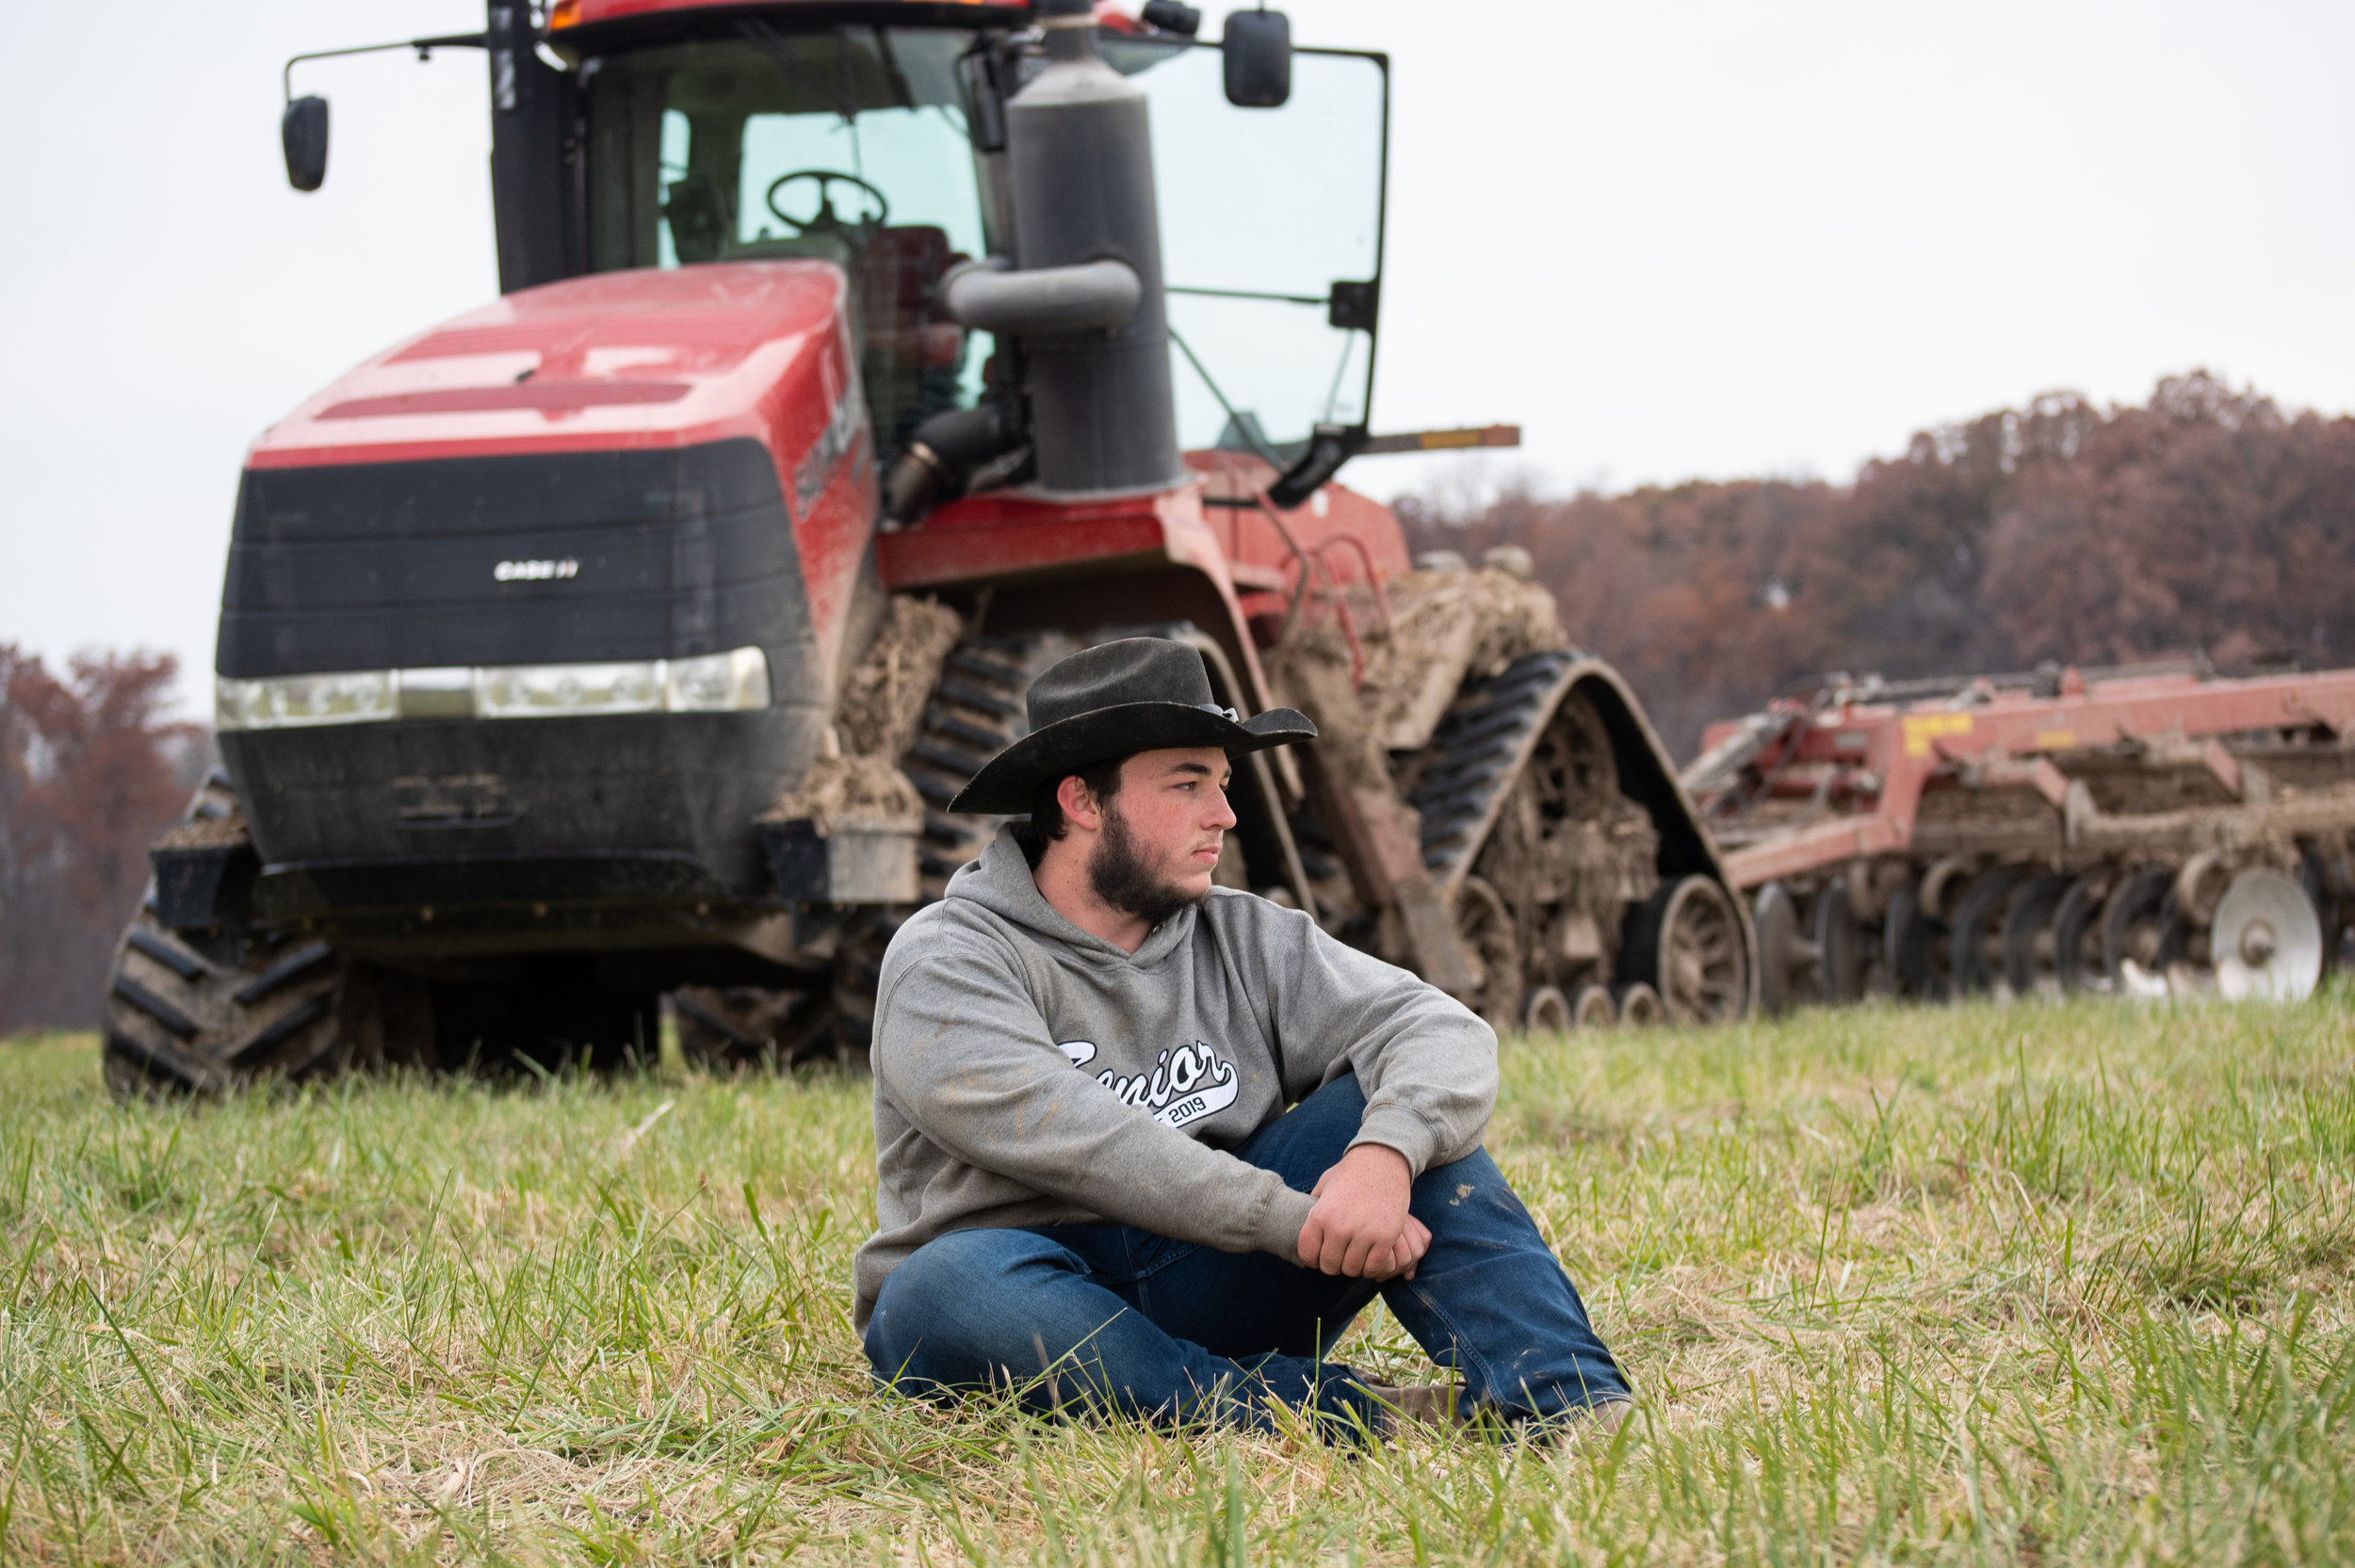 Senior Portrait on the Farm in field | Huntington North High School Class of 2019